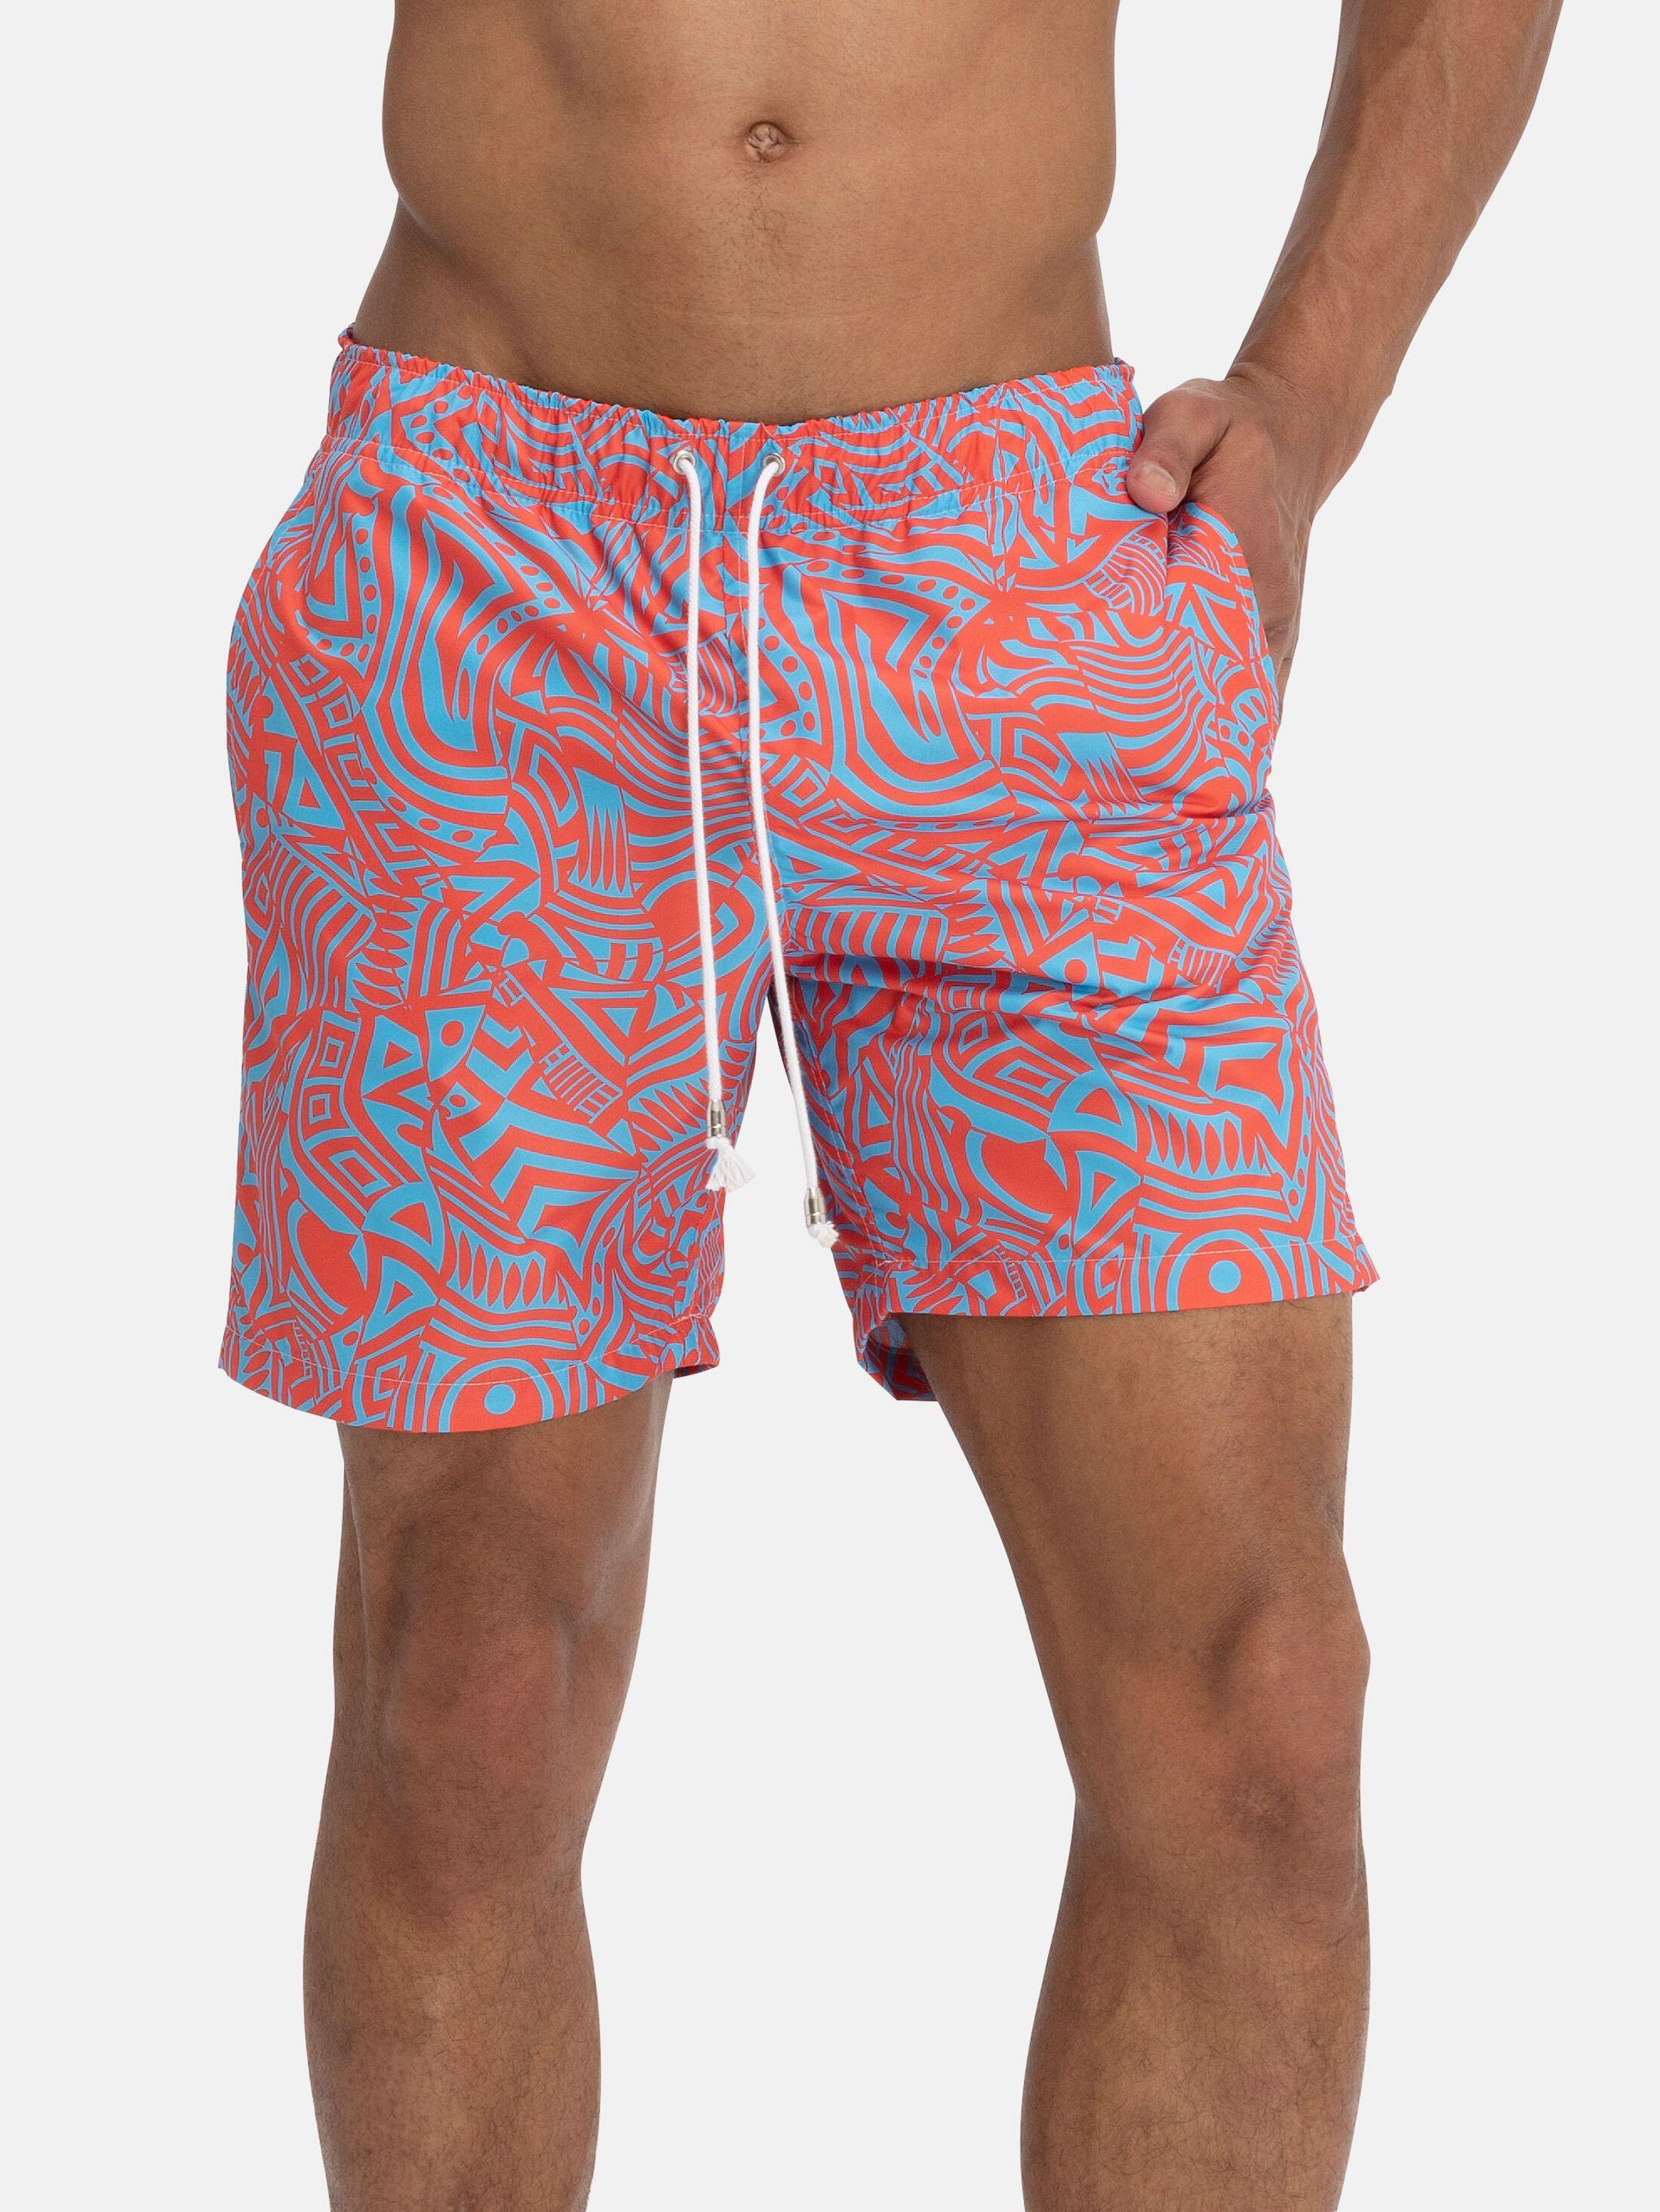 Design Your Own Swim Shorts Online